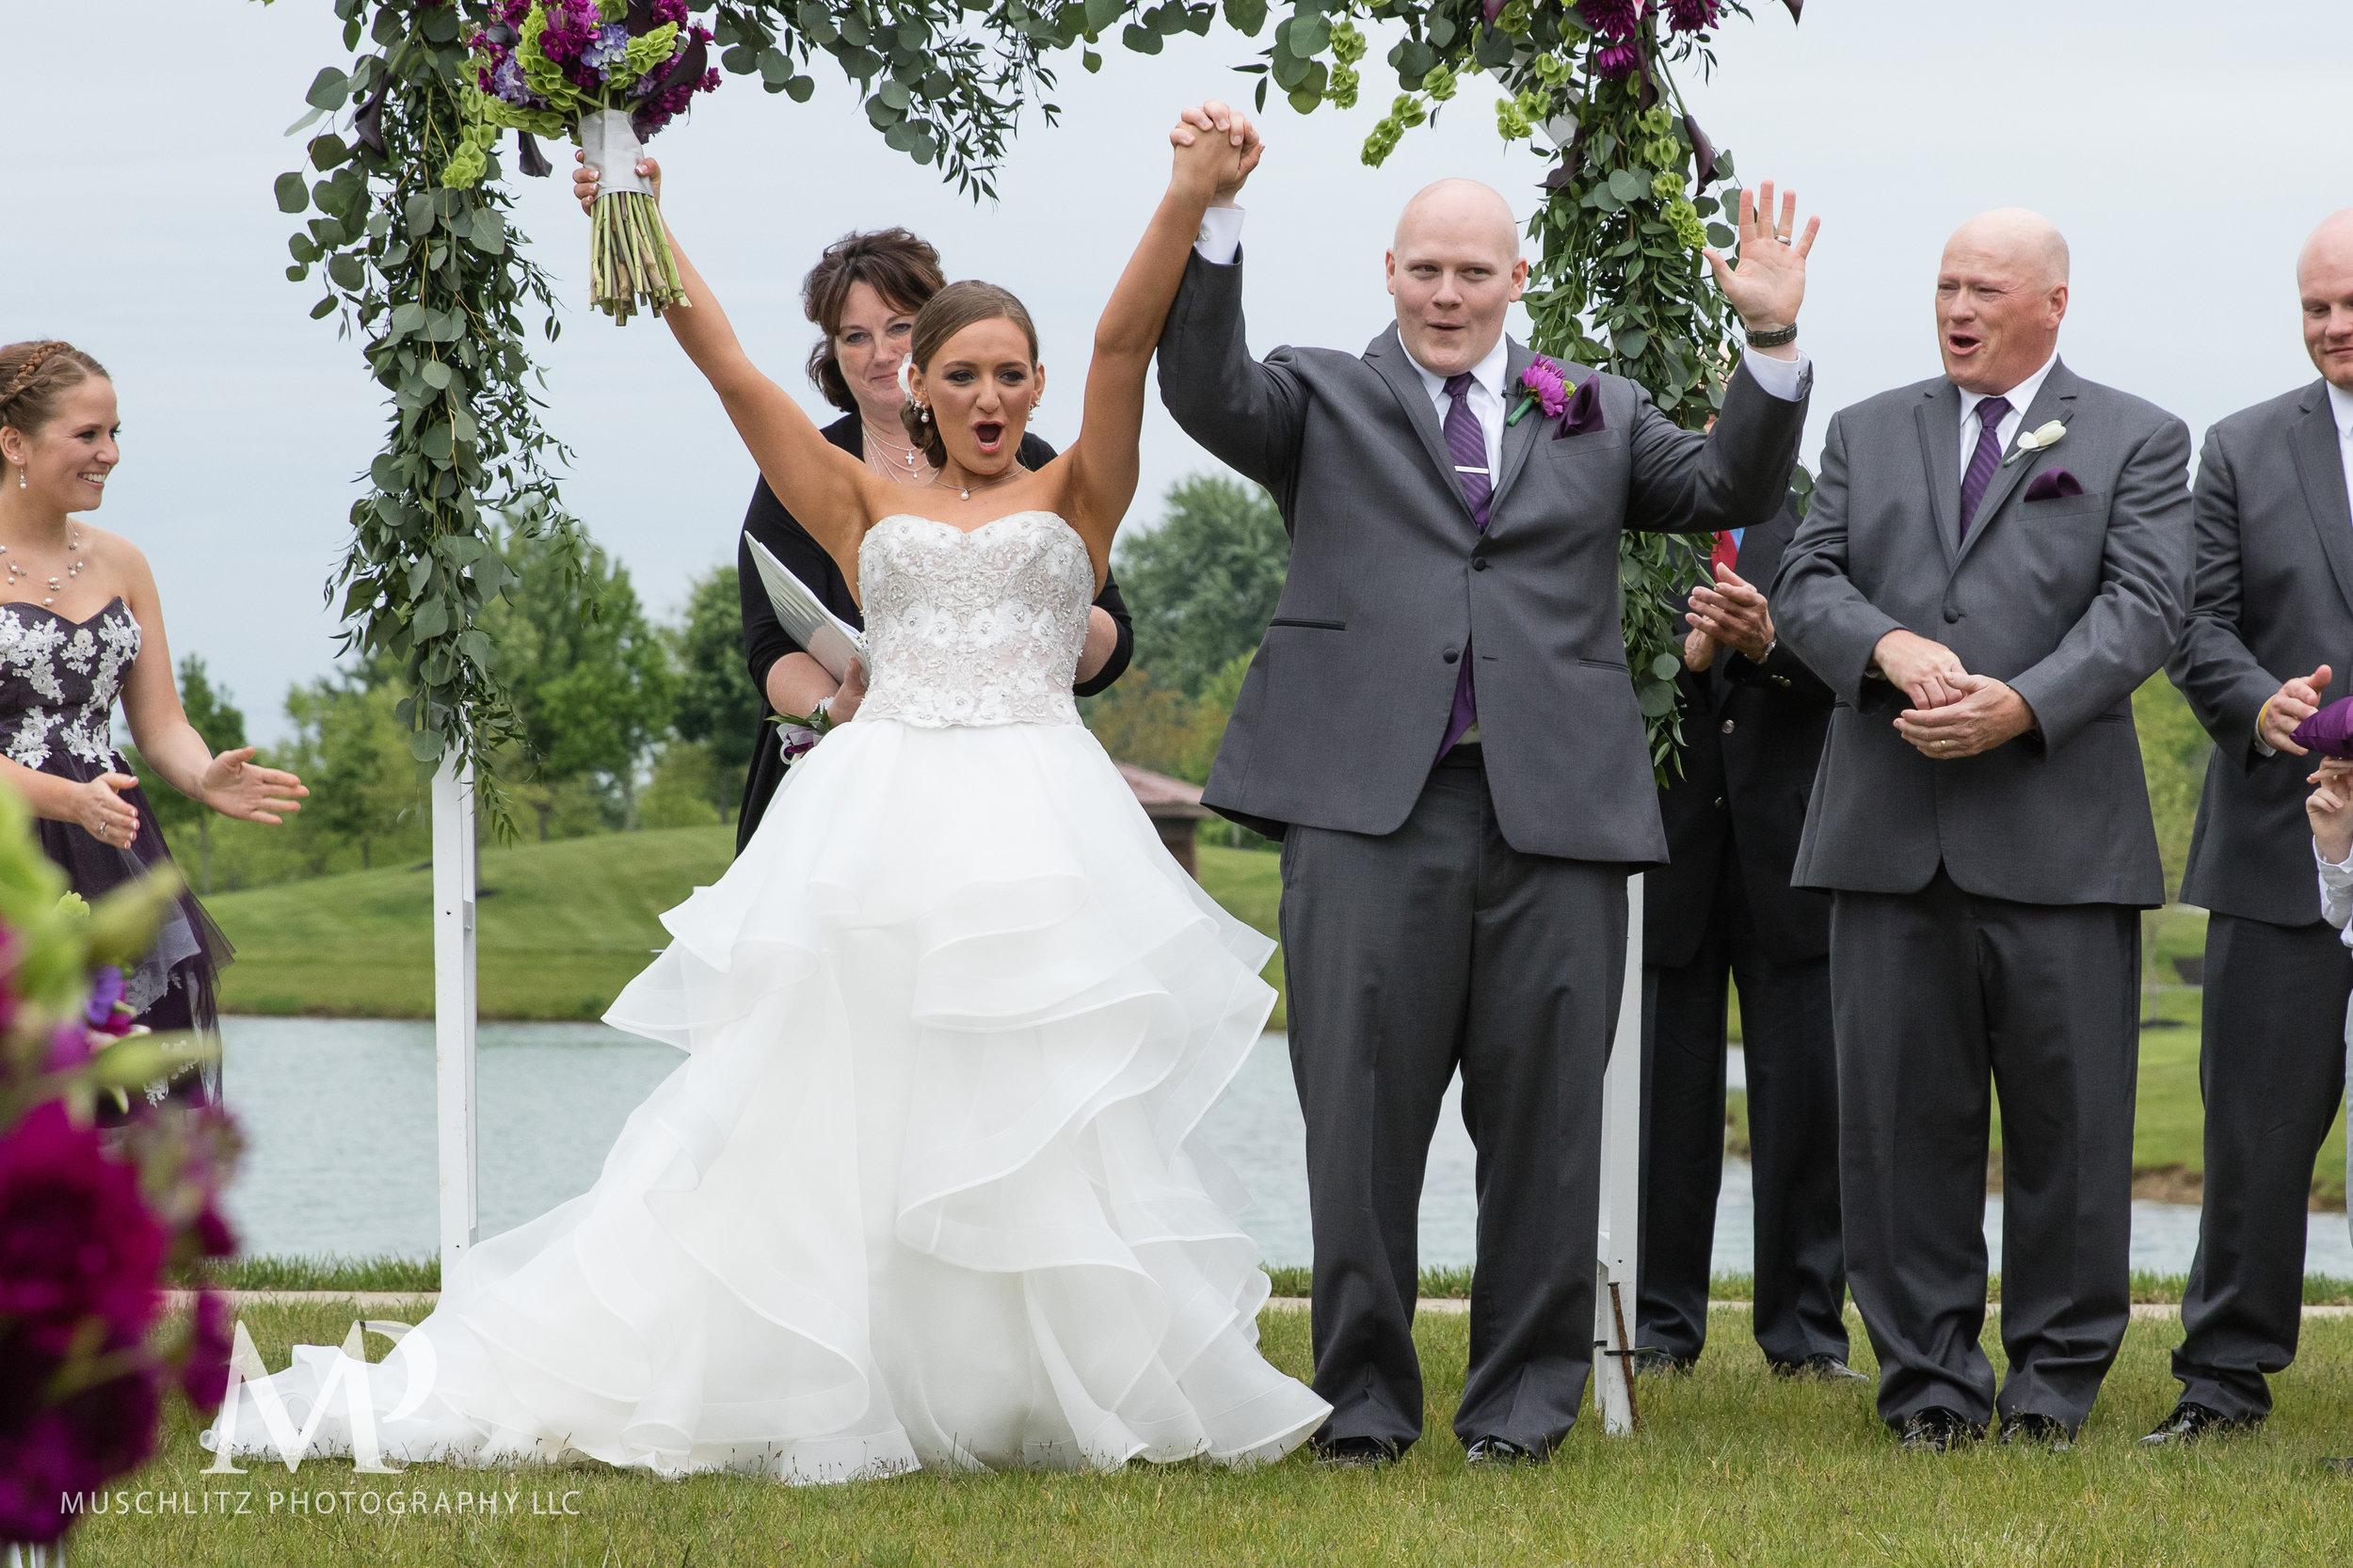 club-at-corazon-wedding-ceremony-reception-columbus-dublin-ohio-ohio-university-theme-044.JPG